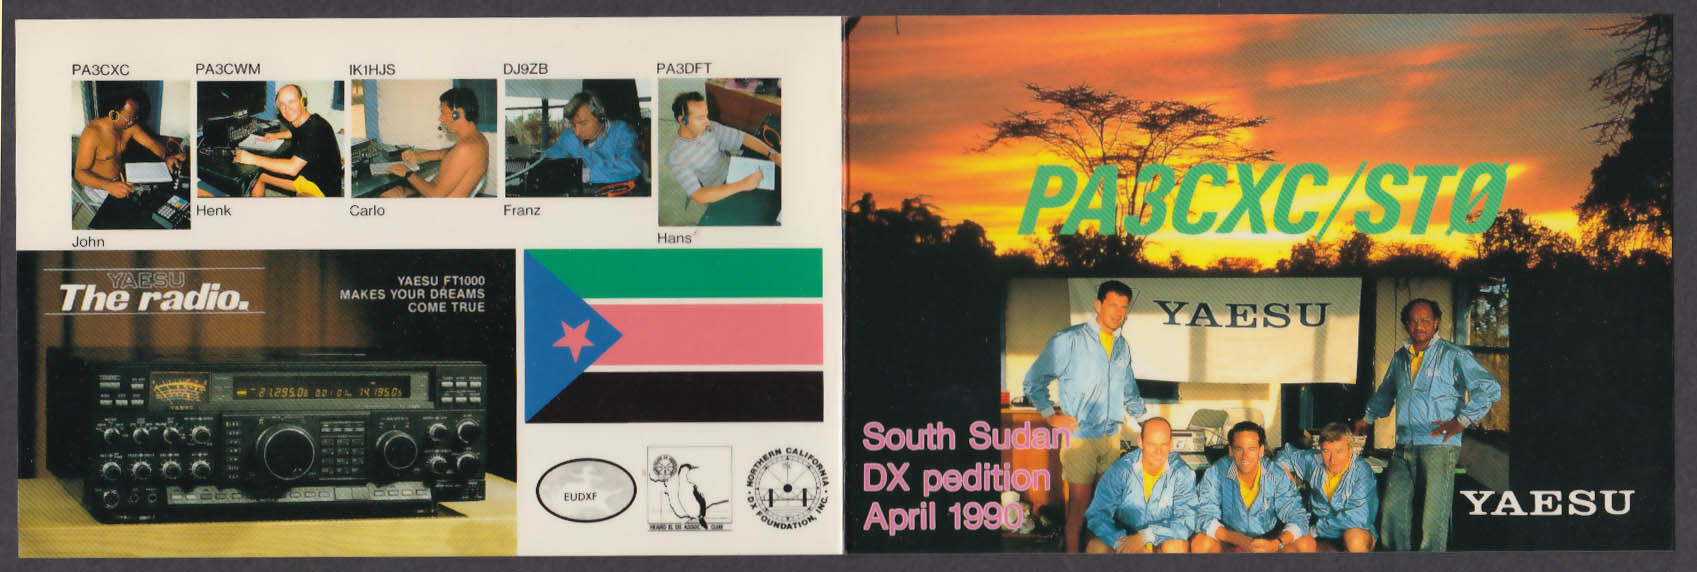 Image for PA3CXC / ST0 South Sudan QSL postcard 1990